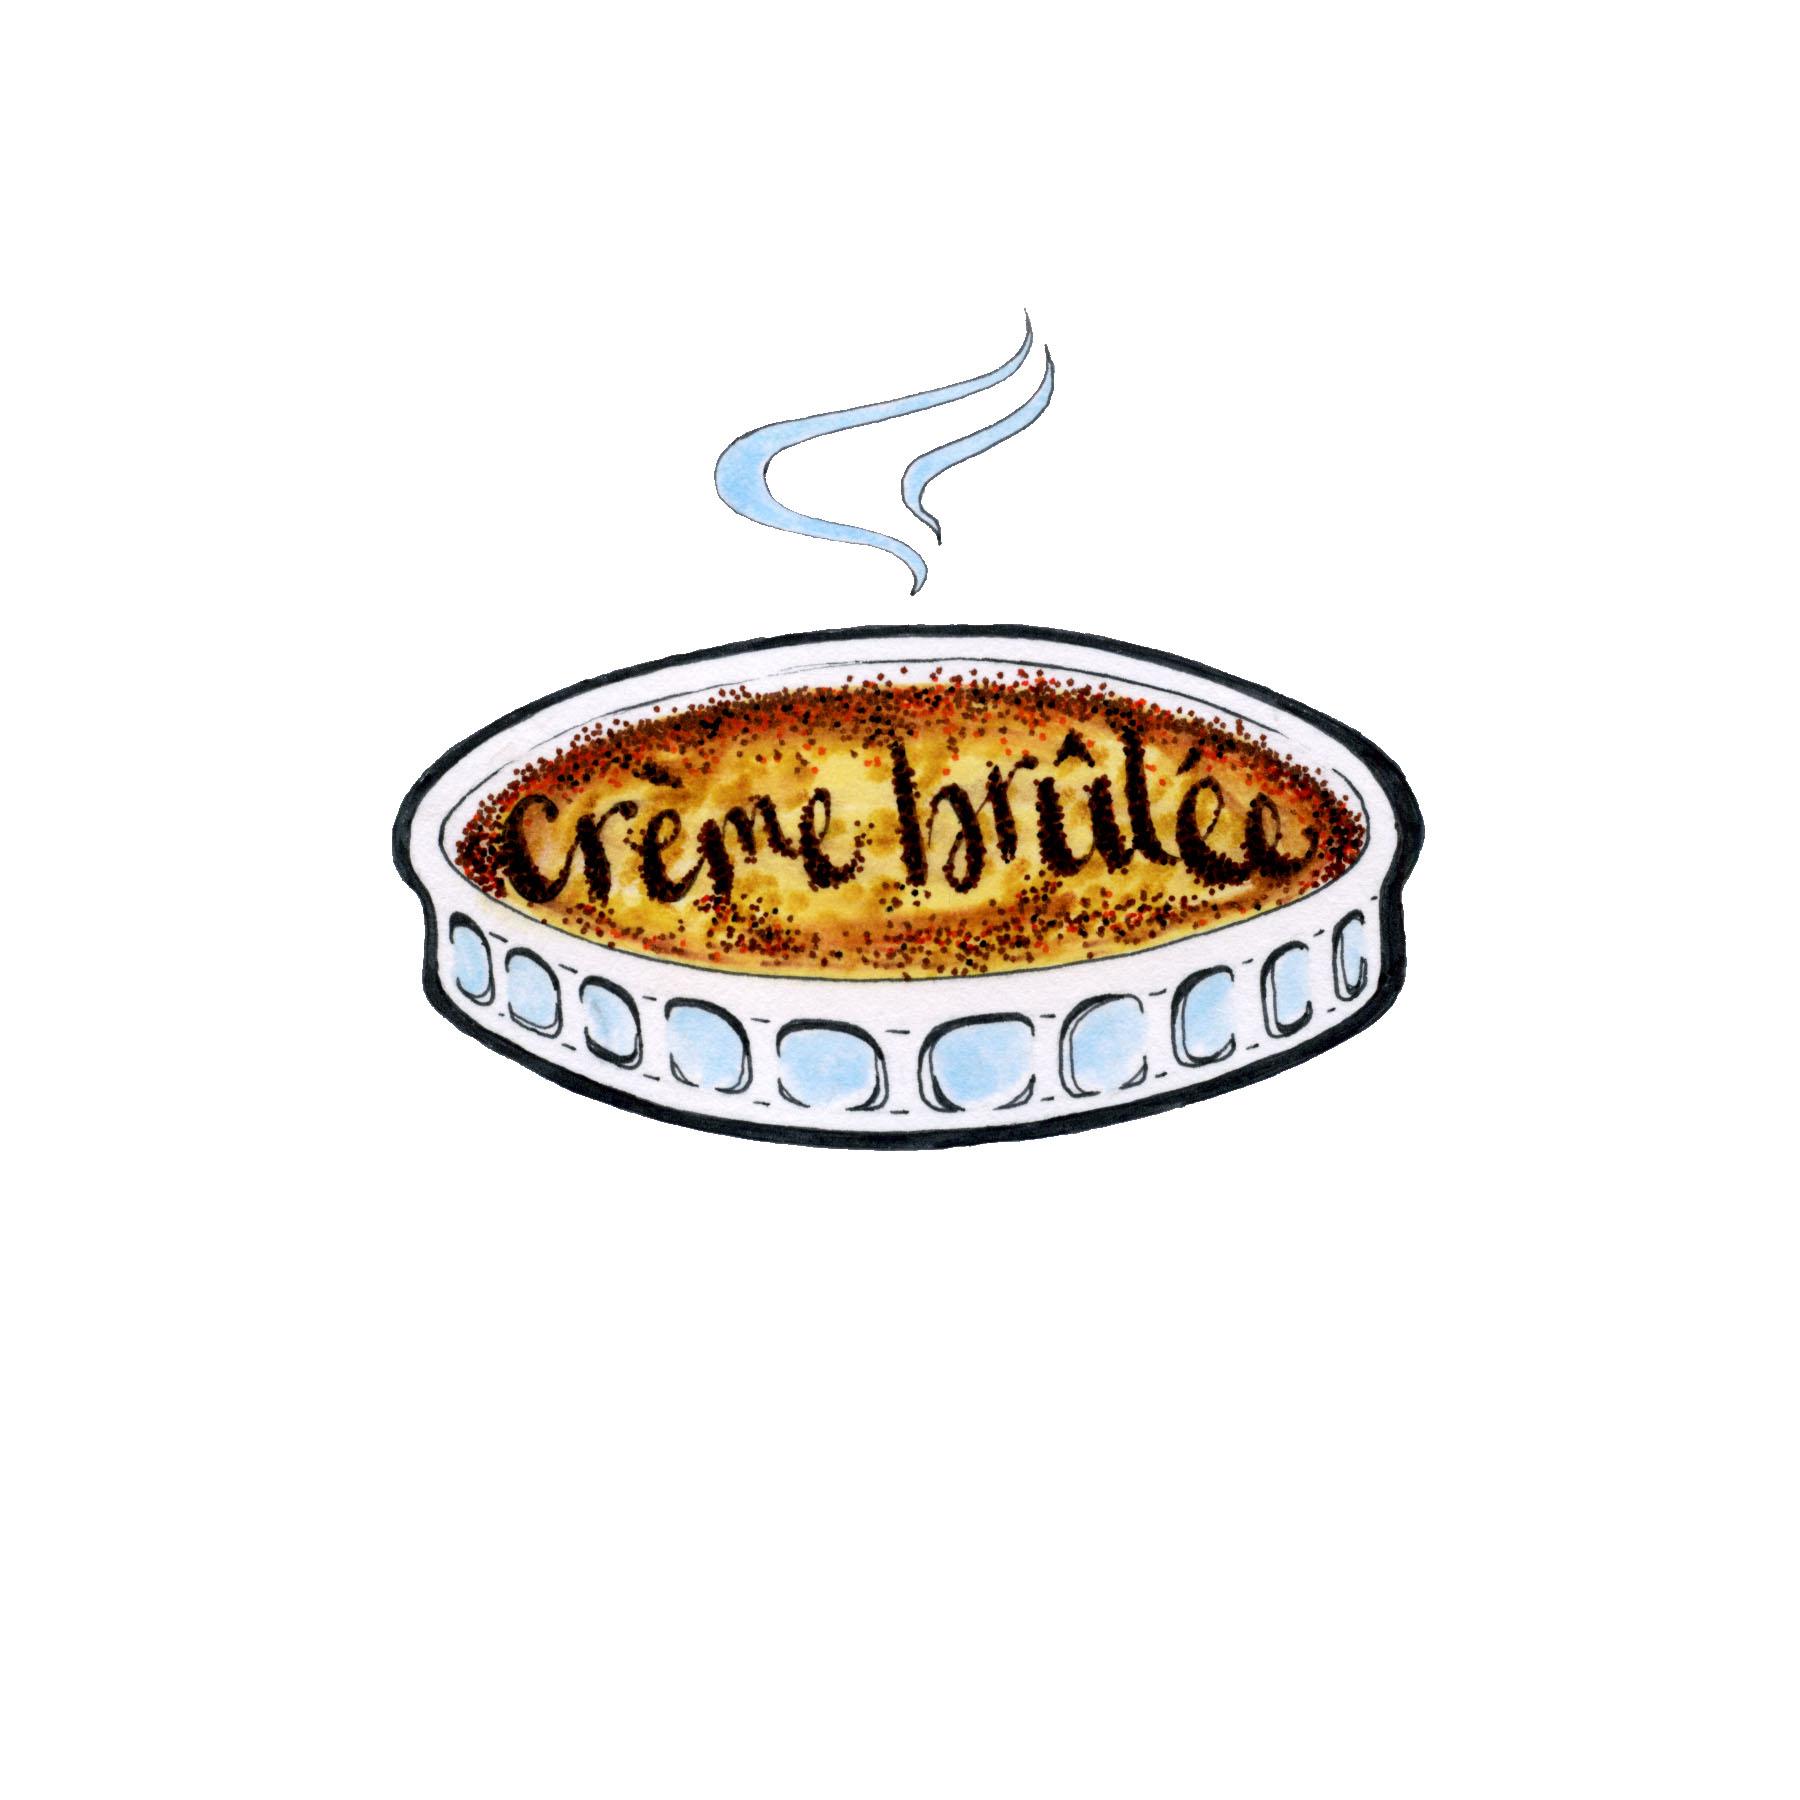 creme brulee white copy.jpg